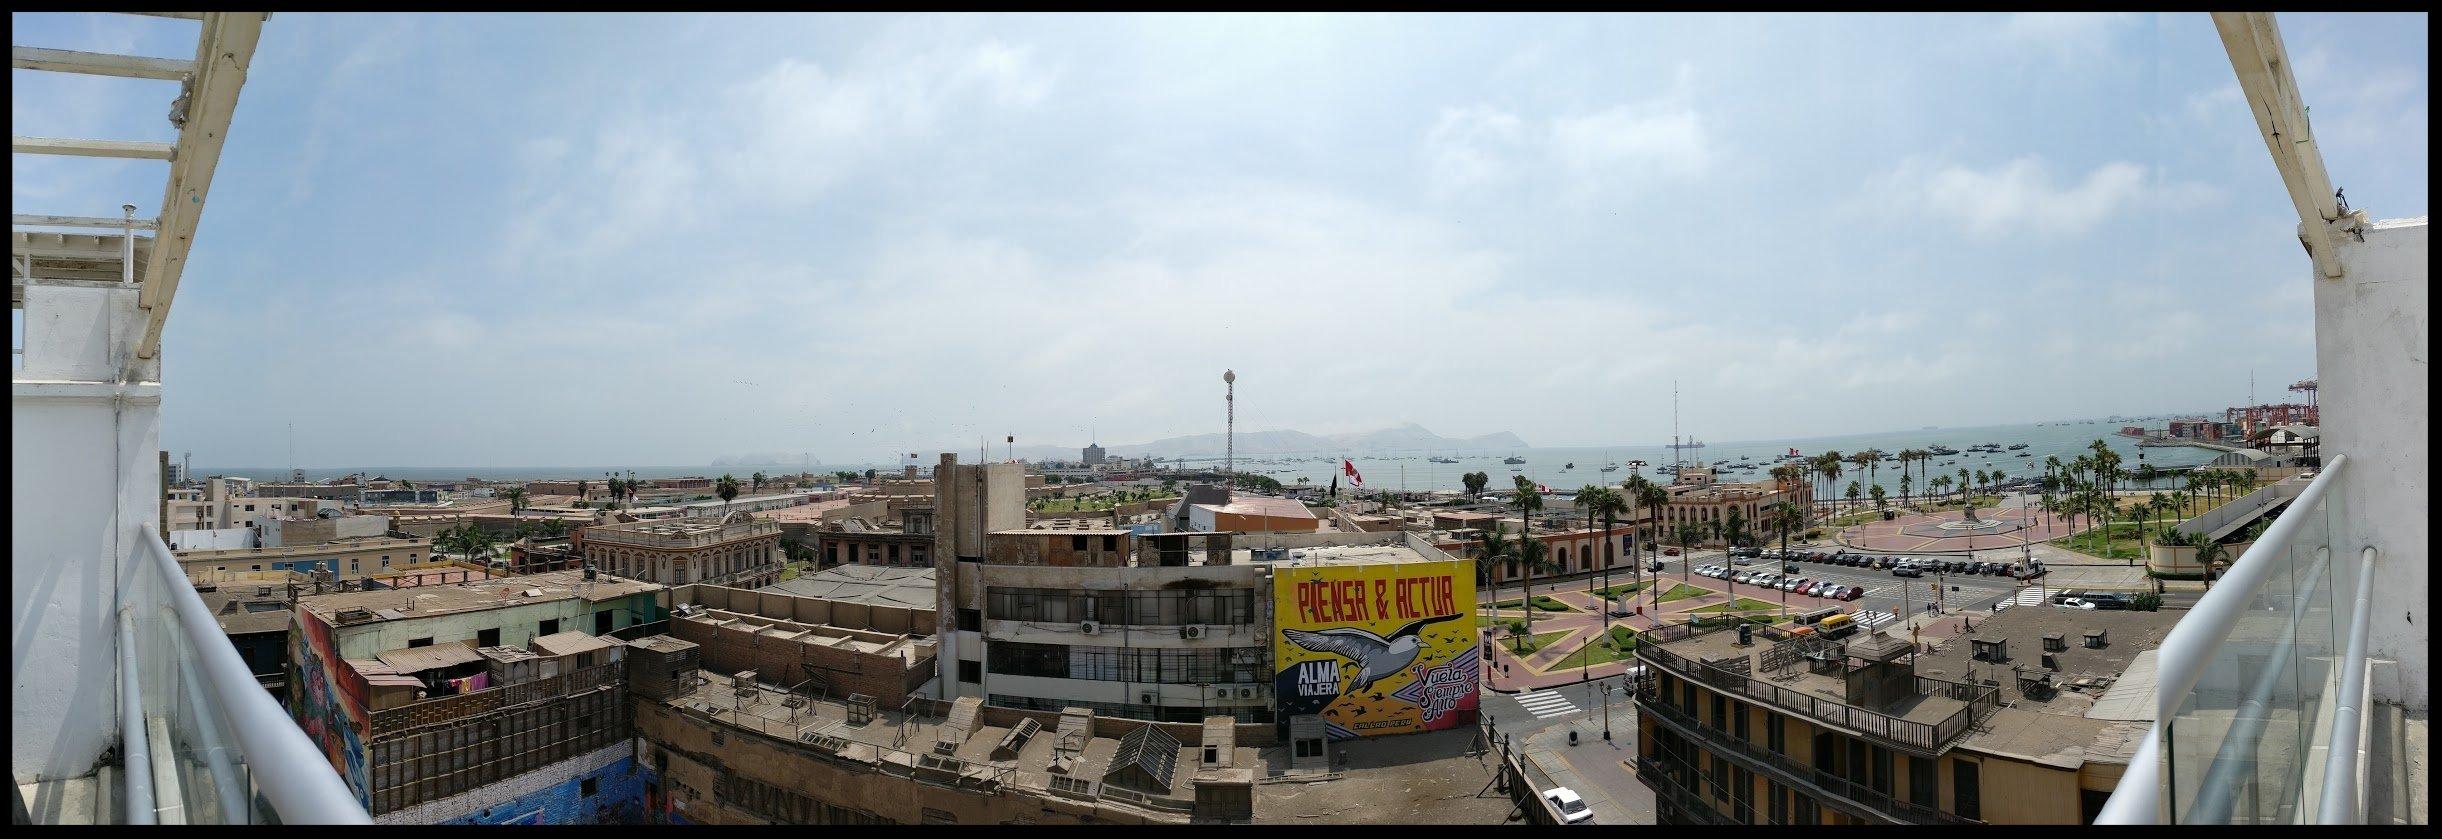 Chim Pum, Callao! Photo taken from a rooftop near La Punta, Callao